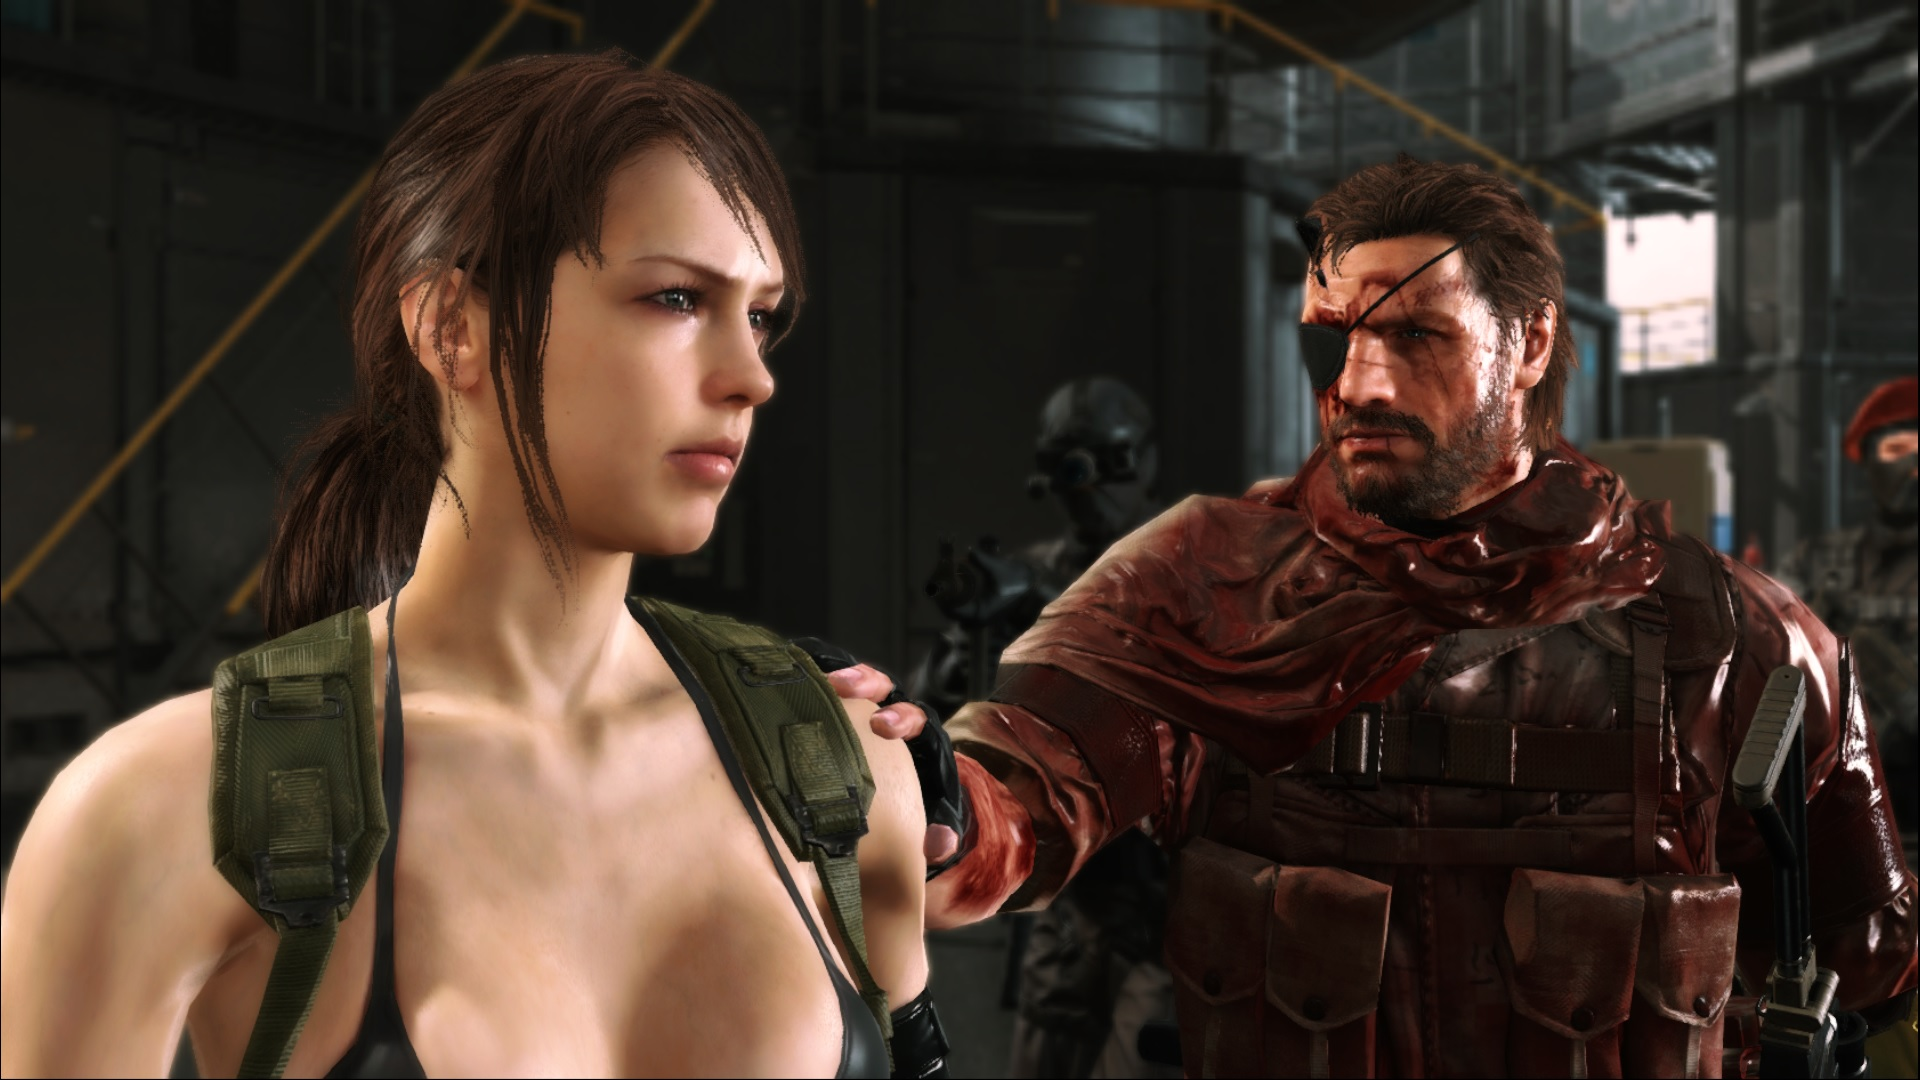 Кореш - Metal Gear Solid 5: The Phantom Pain мгс, снейк